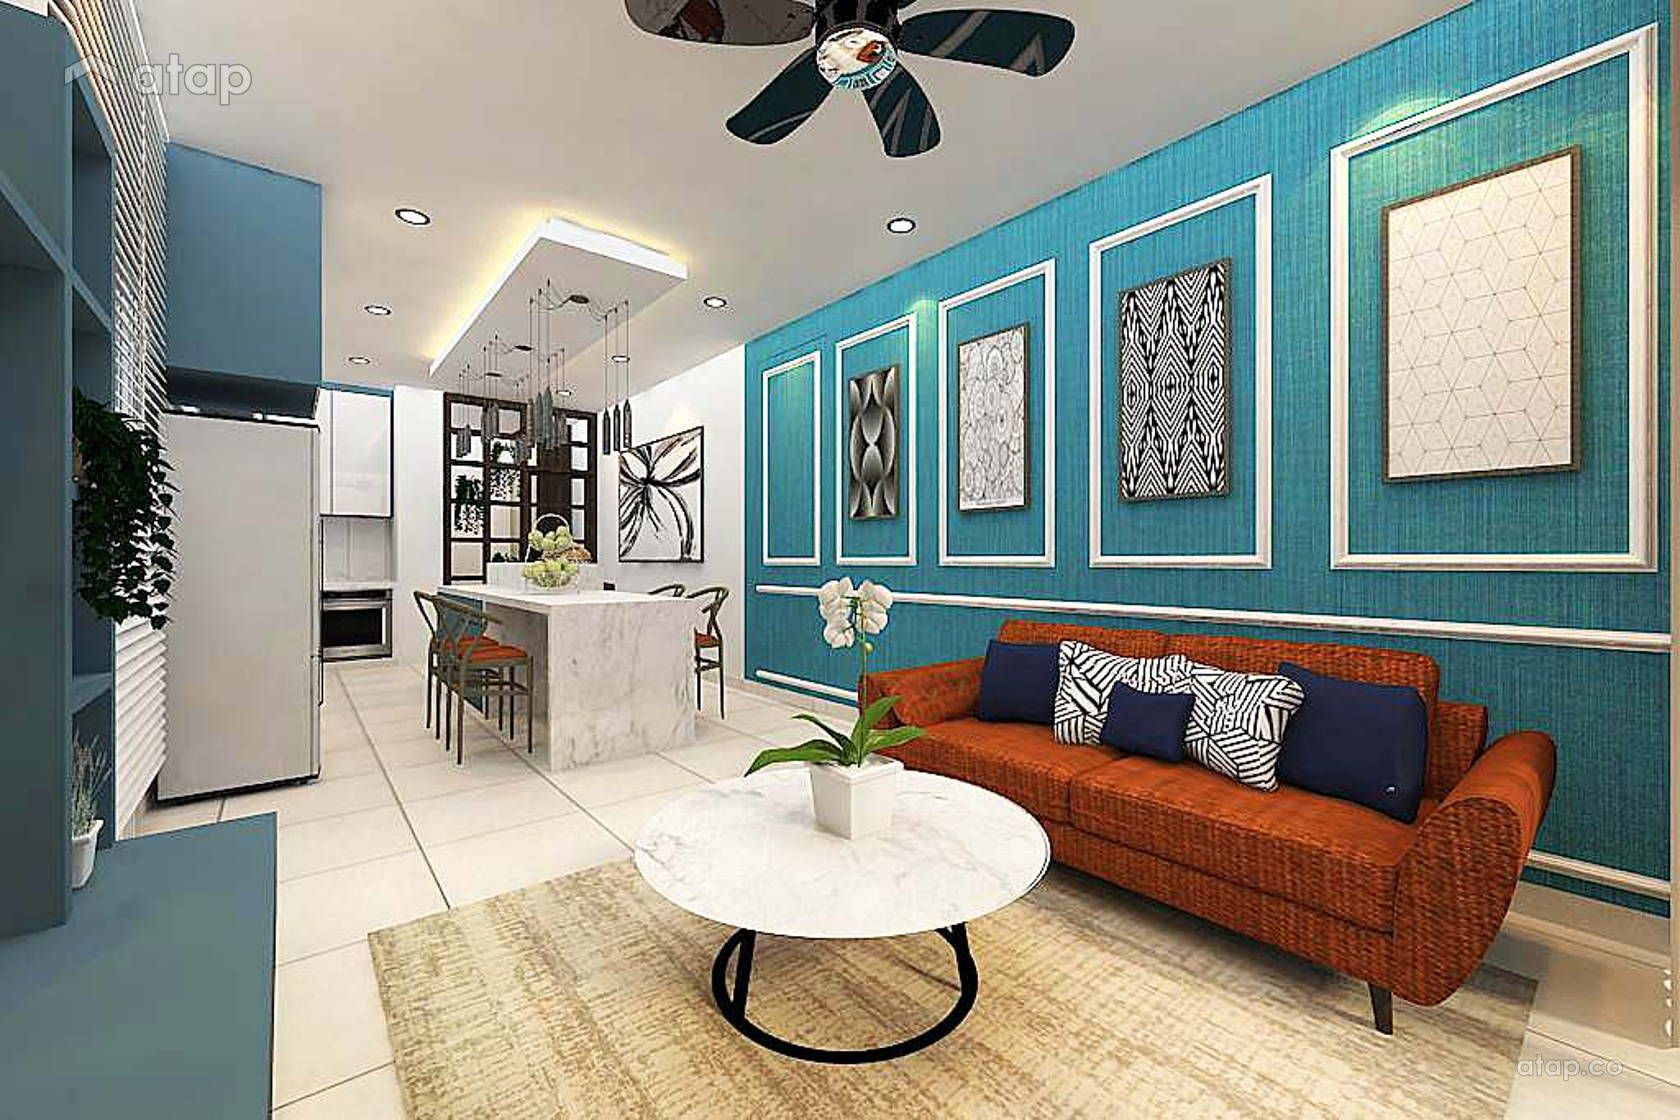 Amberside Unit Country Garden Danga Bay Interior Design Renovation Ideas Photos And Price In Malaysia Apartment Living Room Apartment Design Interior Design